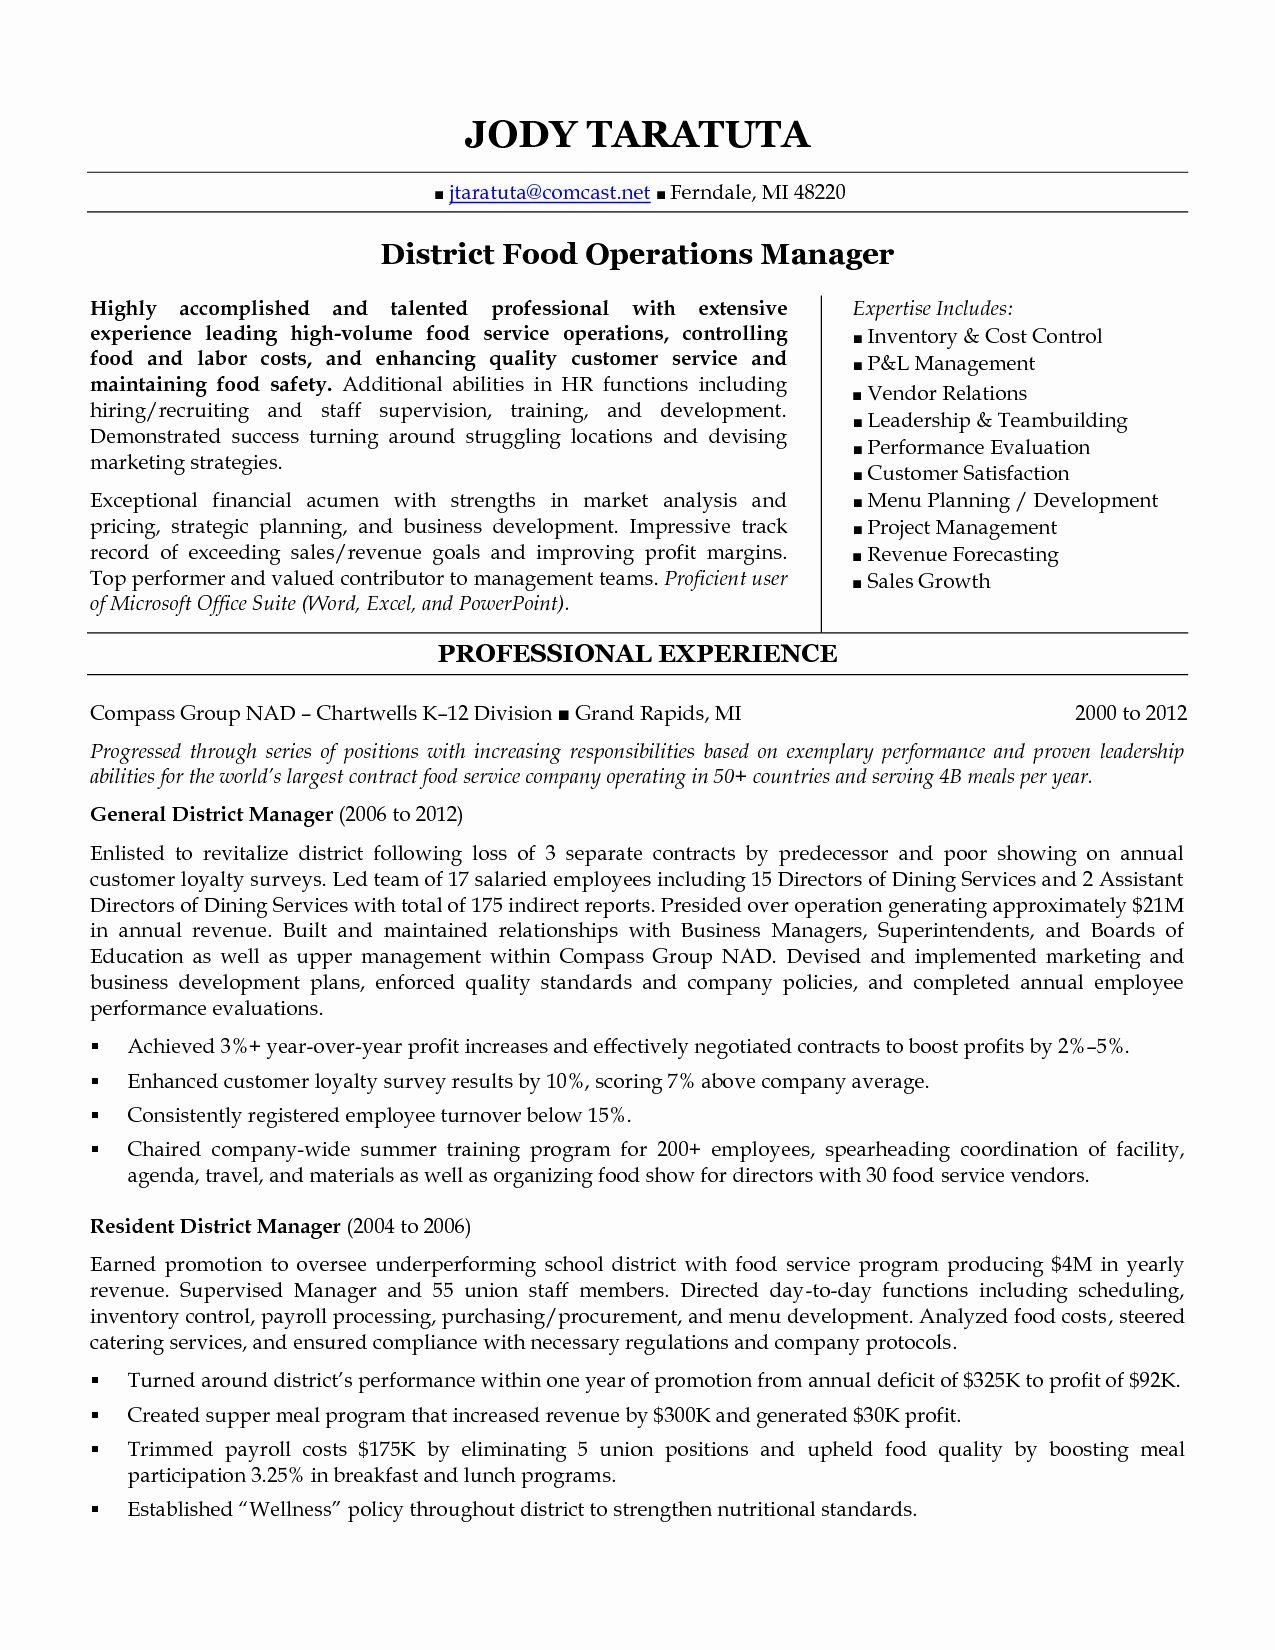 25 Restaurant Manager Resume Samples Pdf in 2020 Manager